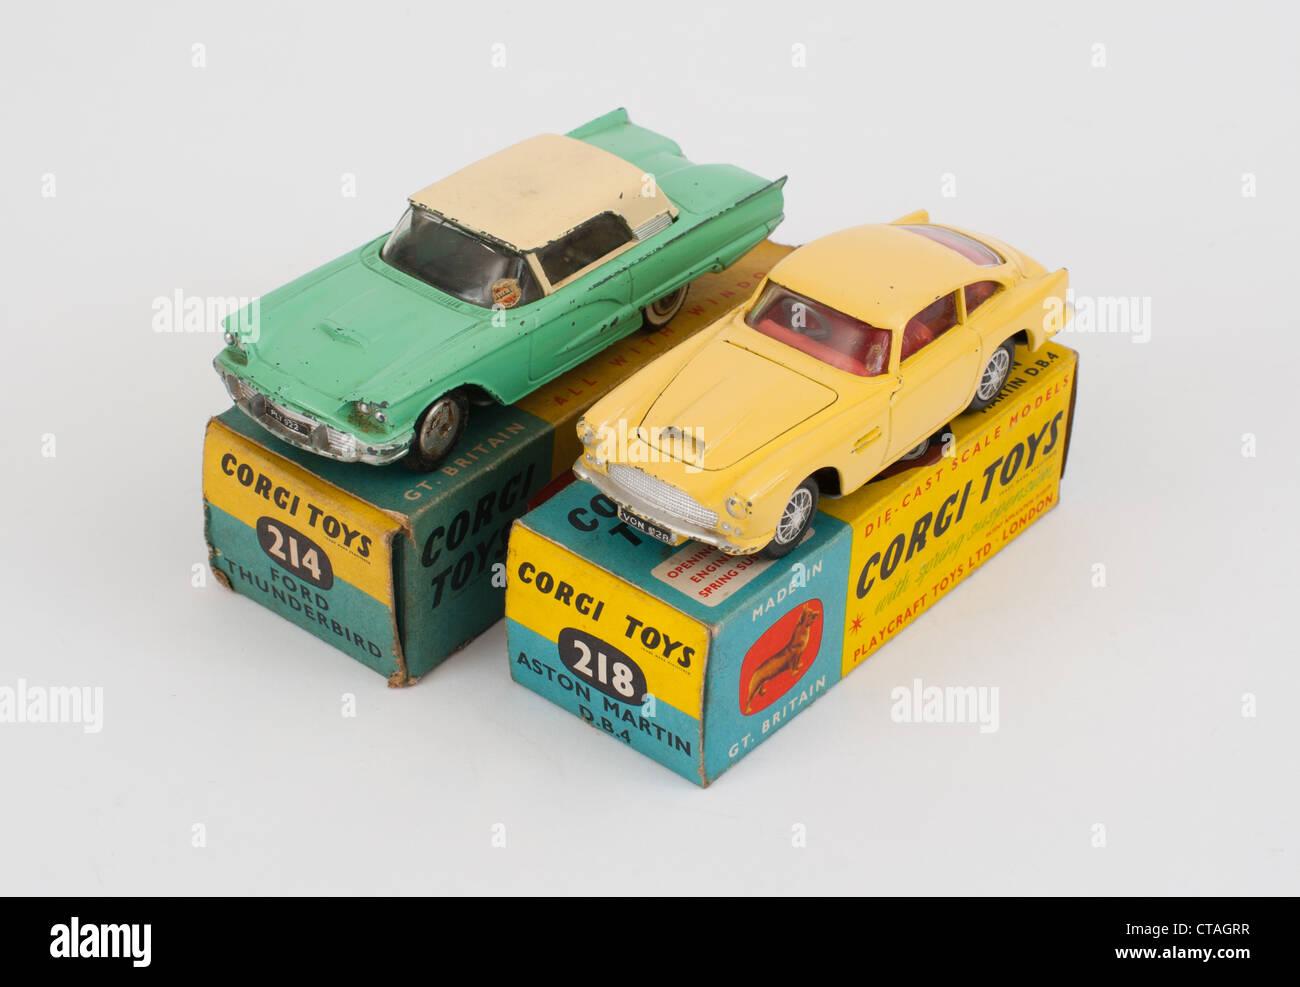 Corgi Aston Martin DB5 and Ford Thunderbird die-cast model toys - Stock Image